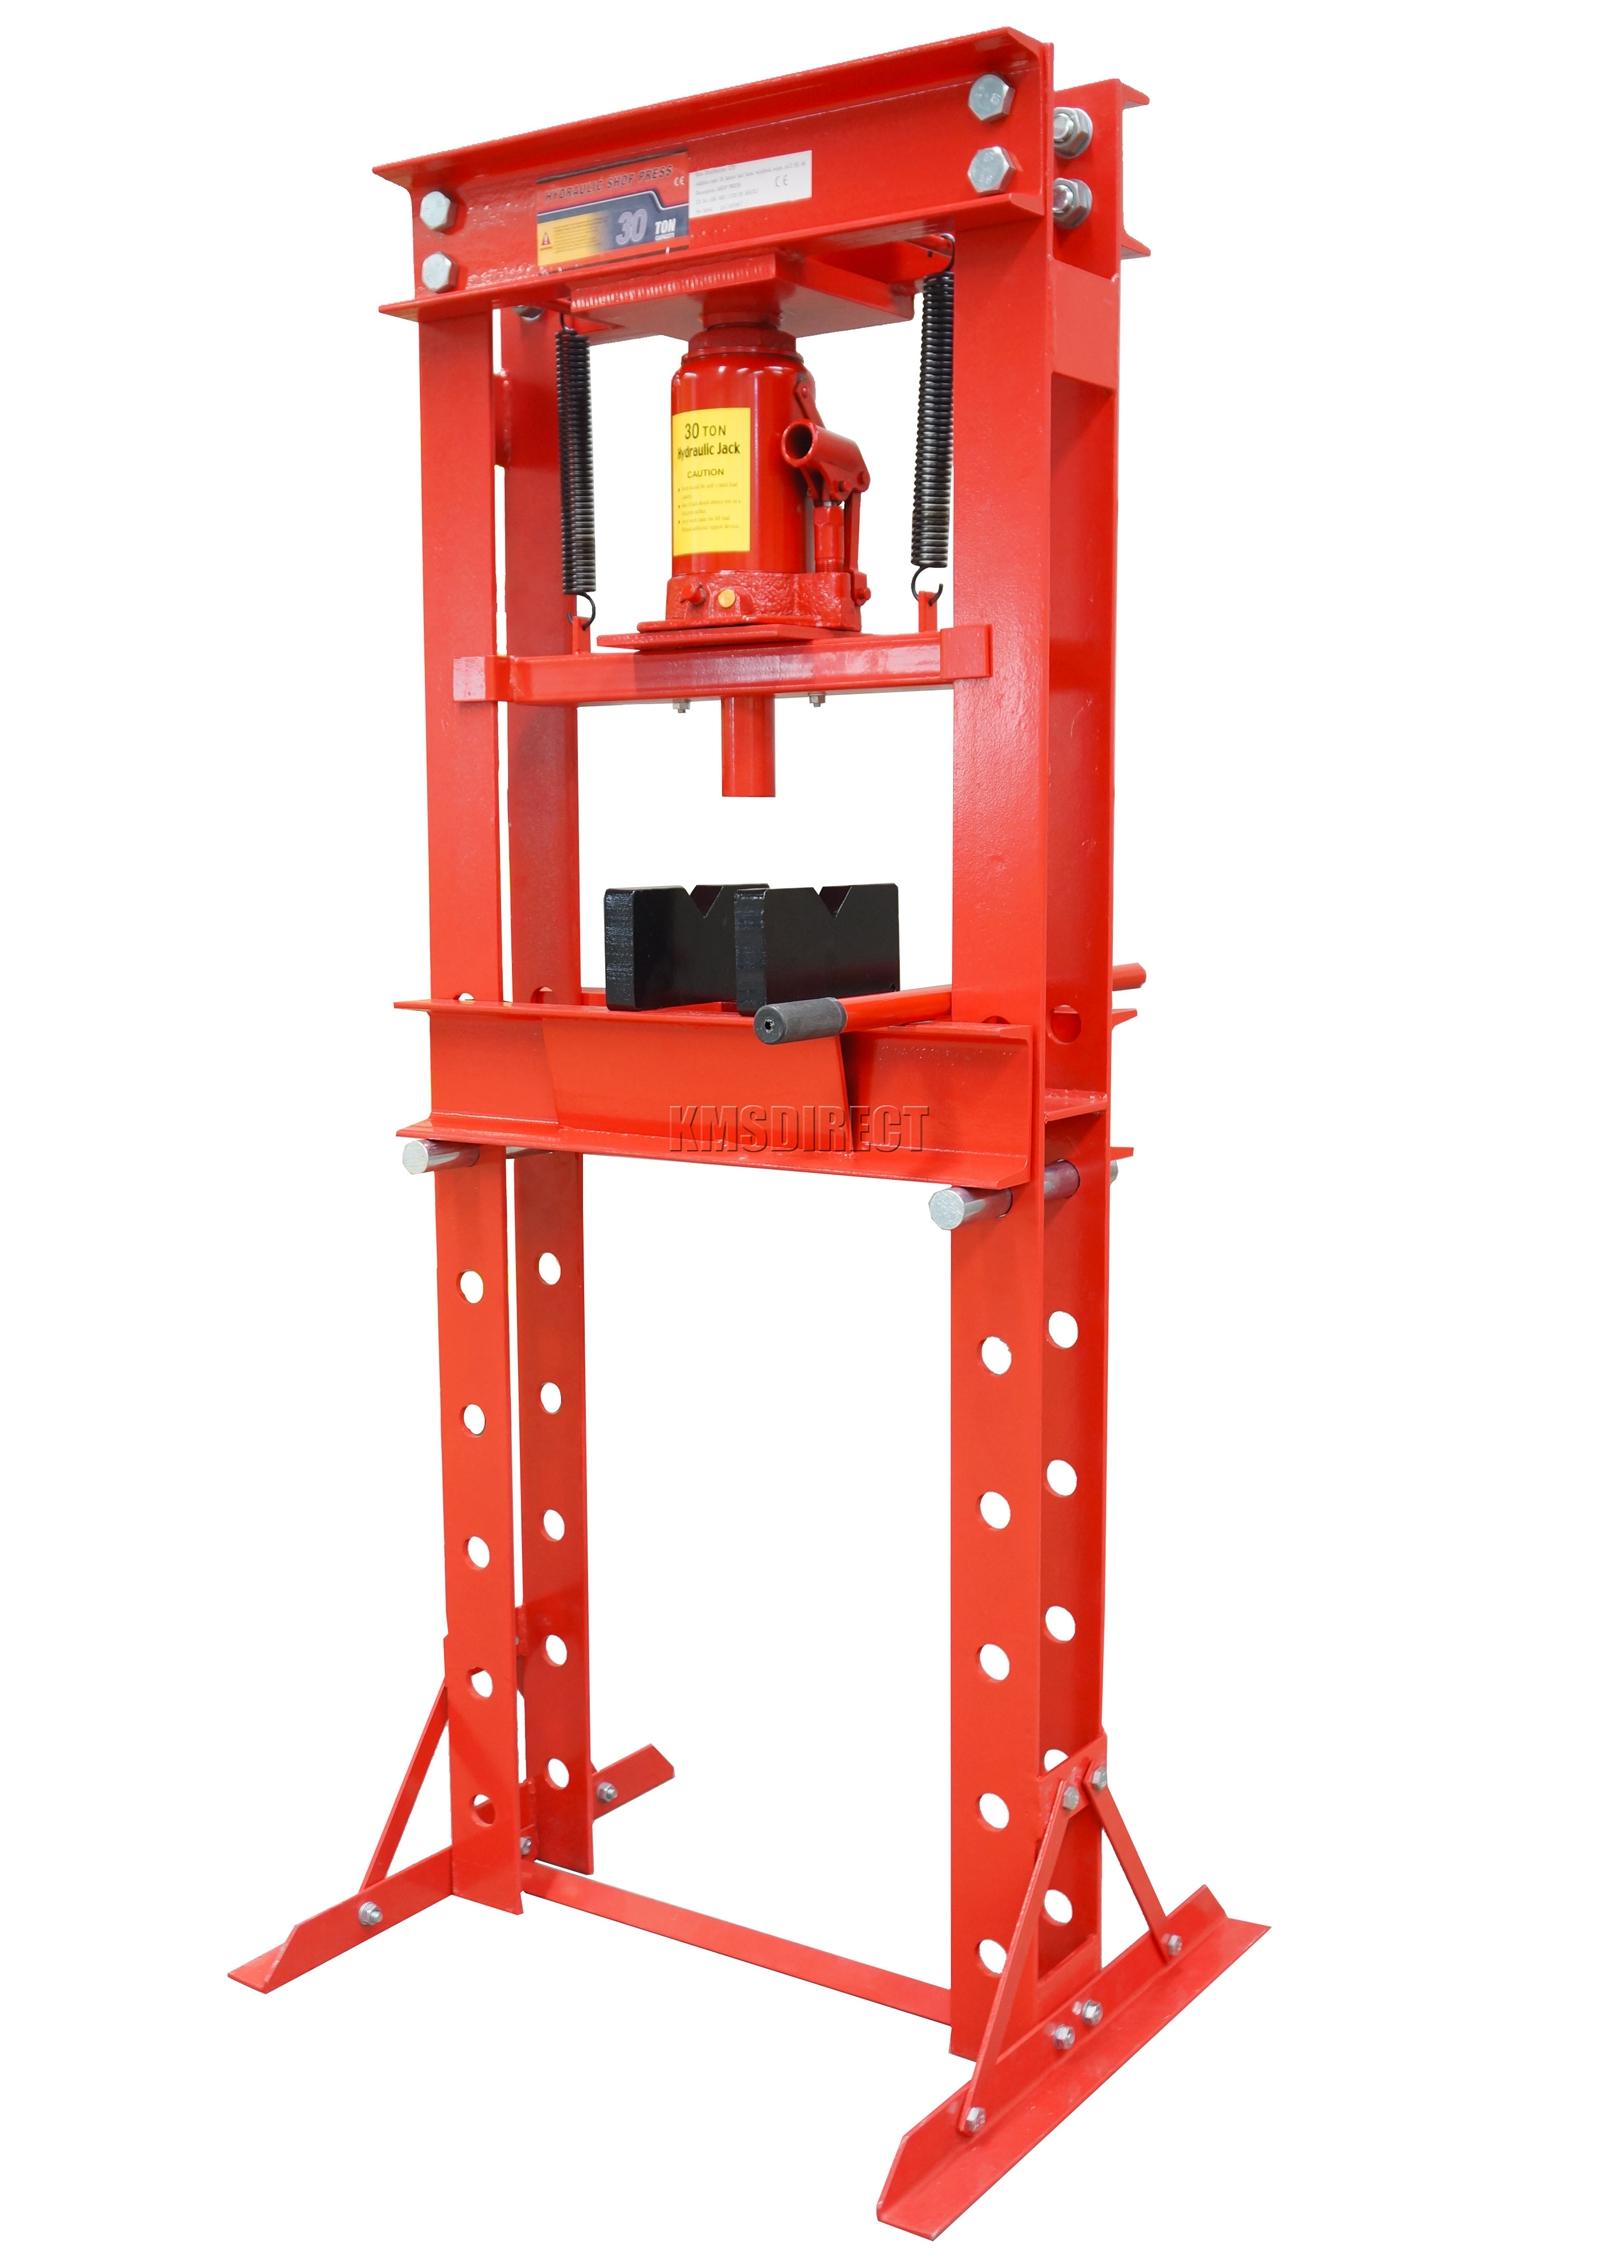 Foxhunter Red 30 Ton Tonne Hydraulic Workshop Garage Shop